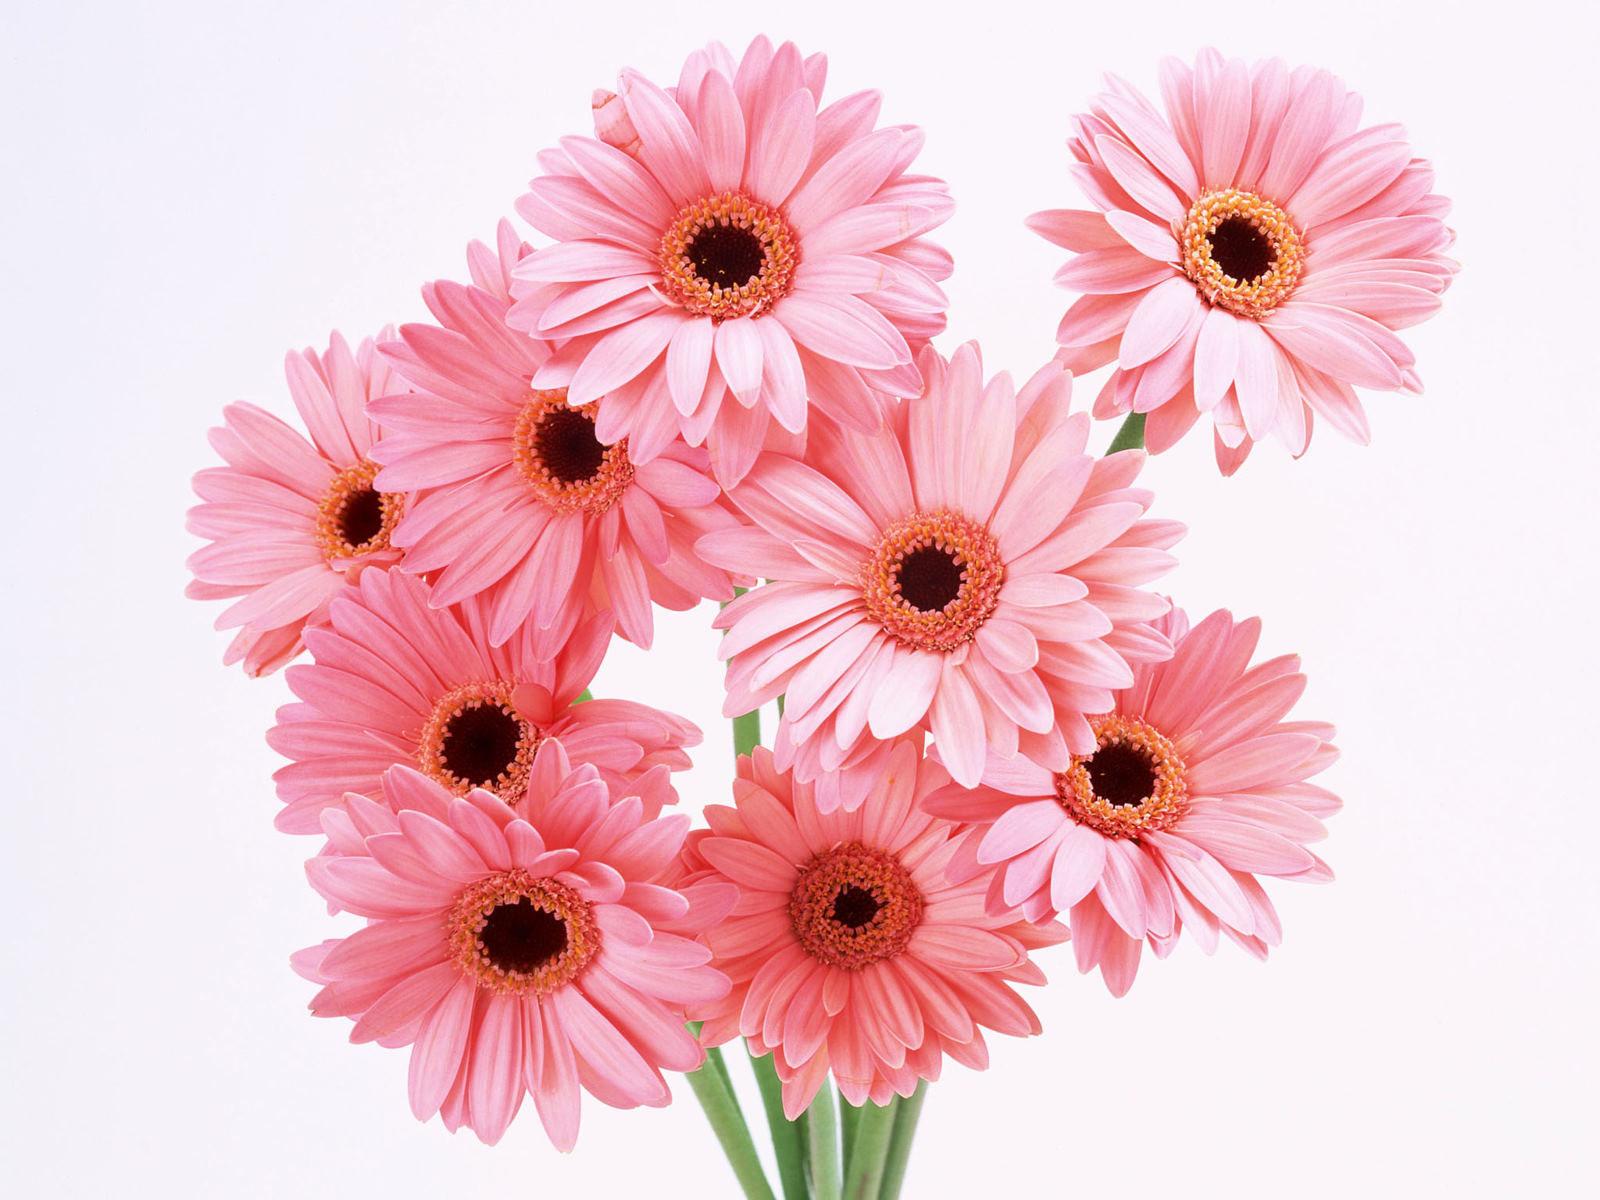 flowers-wallpapers-hd-desktop-beautiful-back-grounds